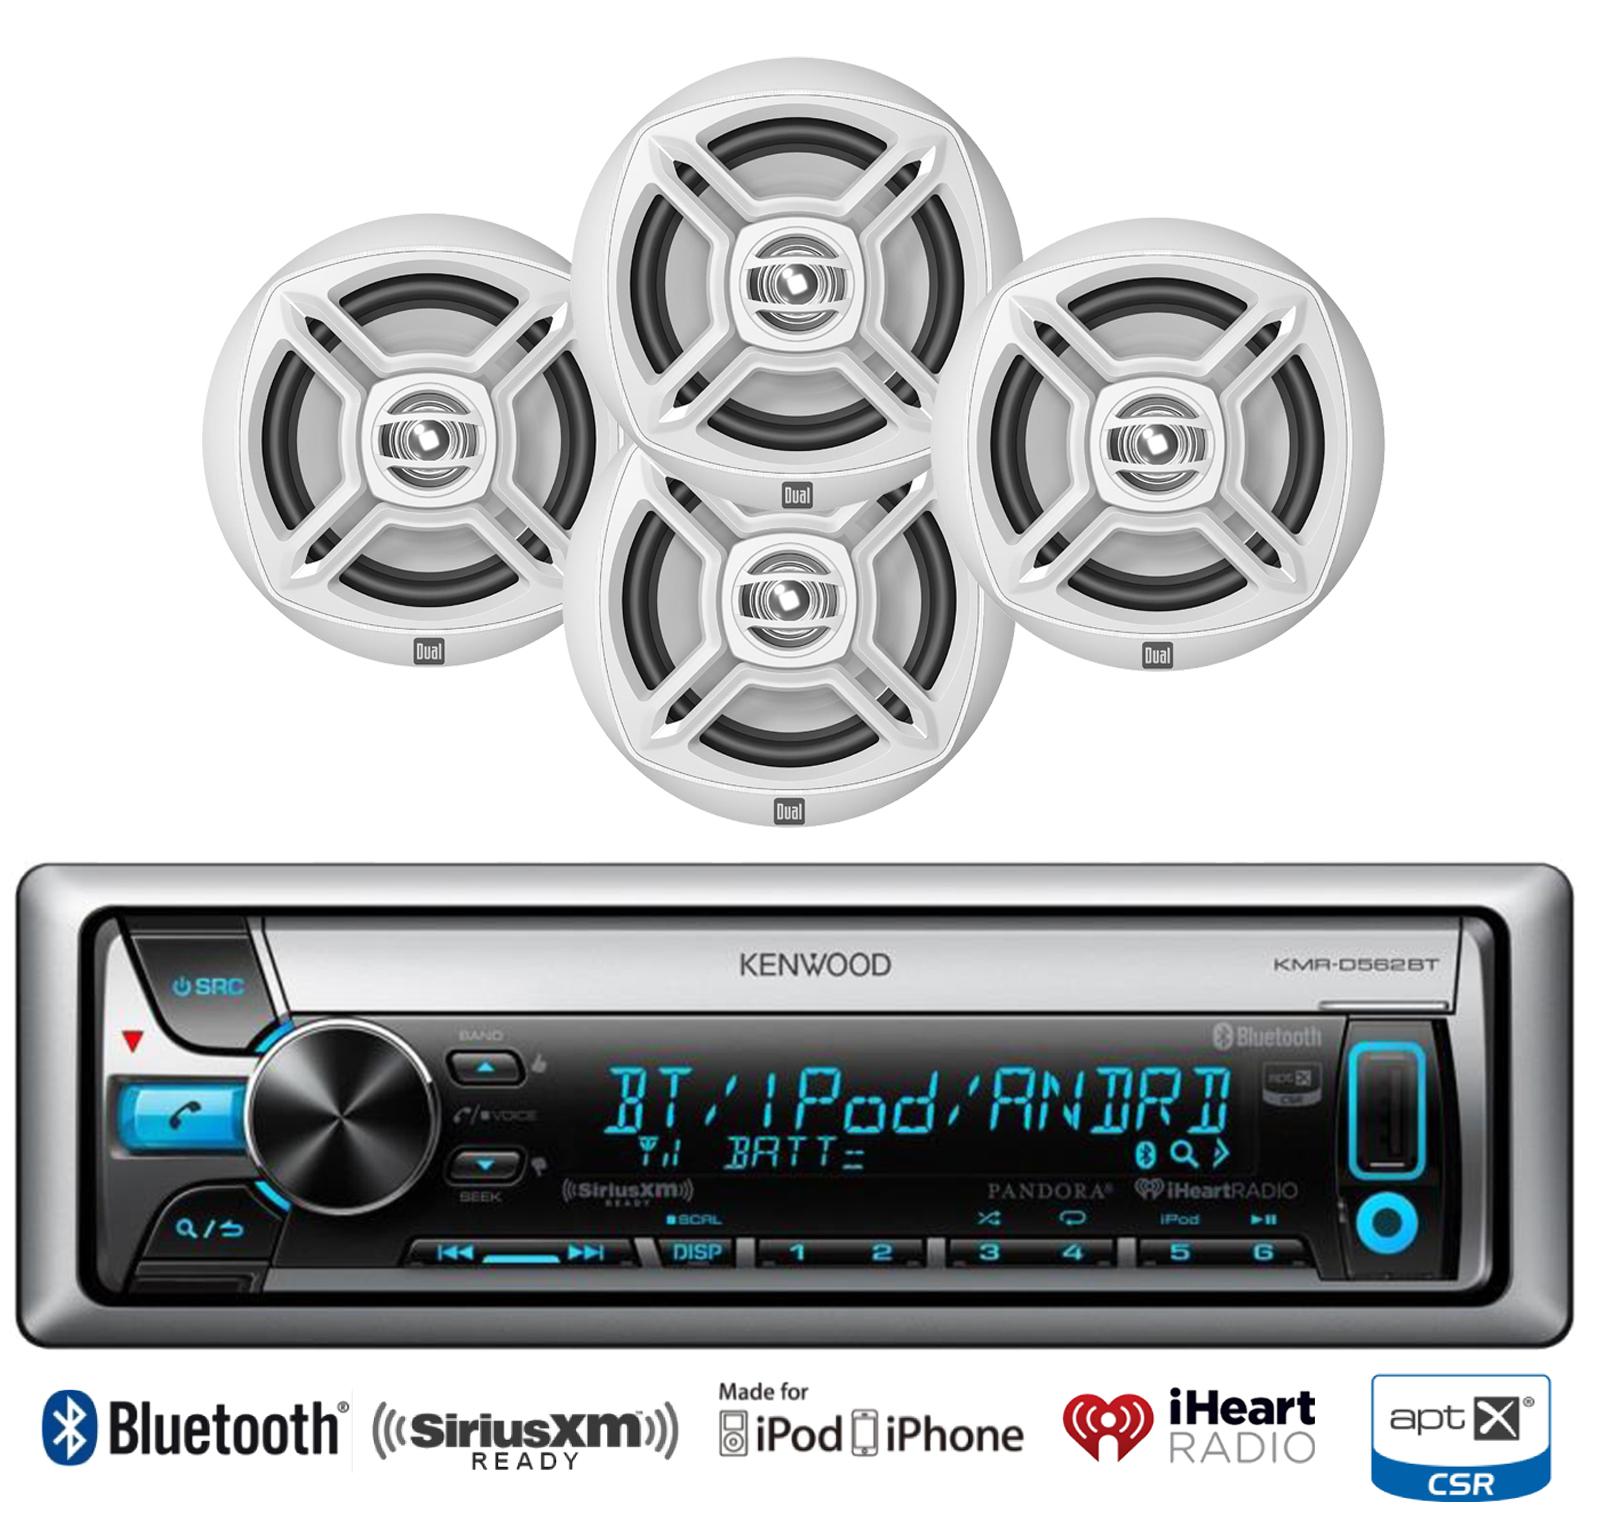 Kenwood Bluetooth Usb Ipod Cd Marine Radio 4 Dual White 65 Kacm3004 Channel 600w Amp Atv Boat Amplifier With Wiring Kit Speaker Set